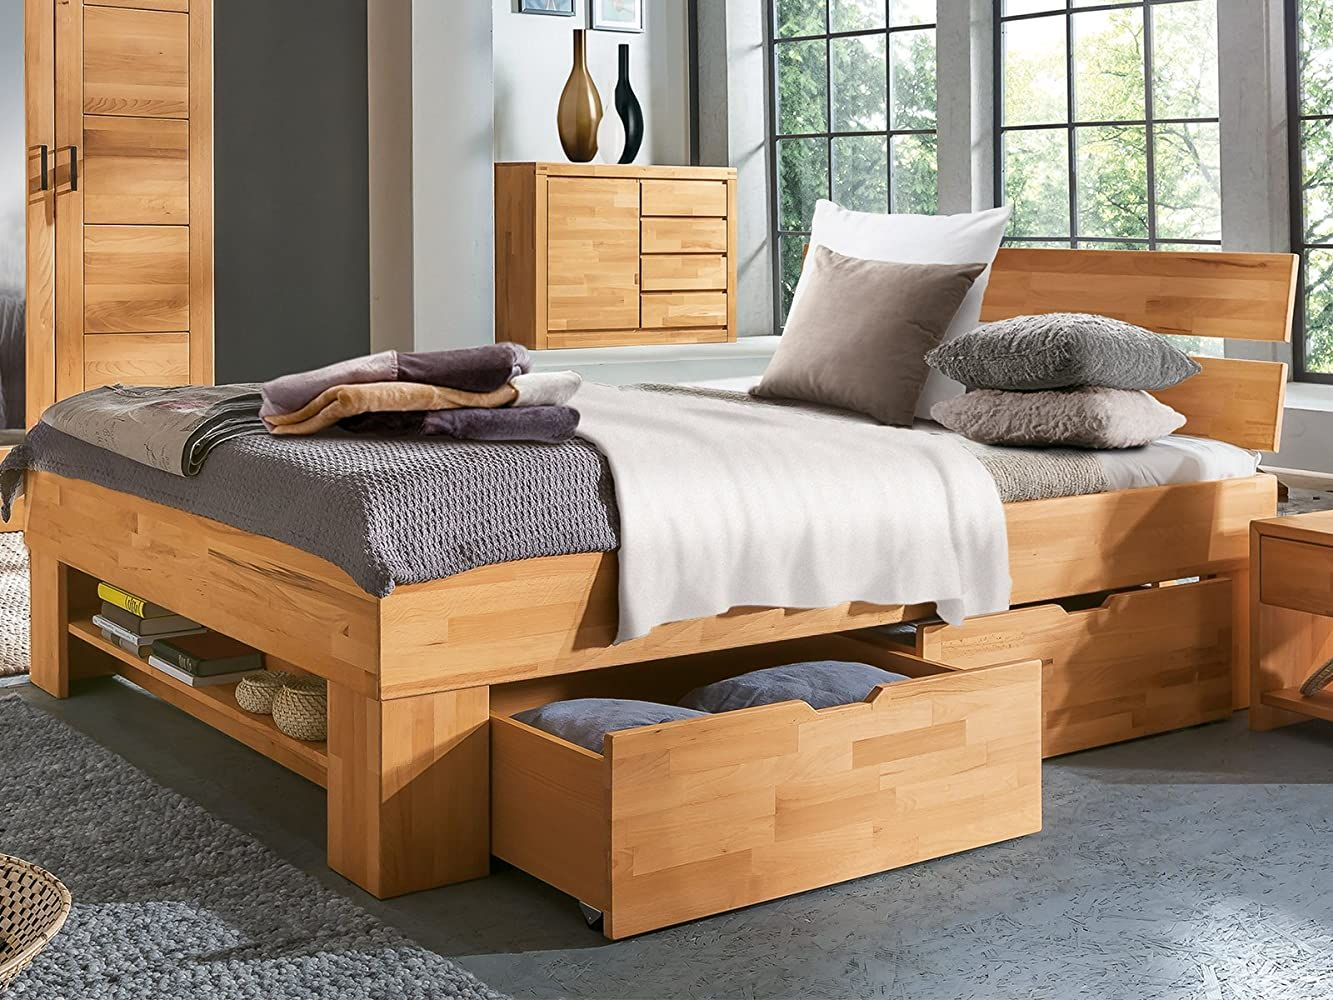 Bett Bettgestell Einzelbett Doppelbett Bettrahmen Ehebett Massivholz